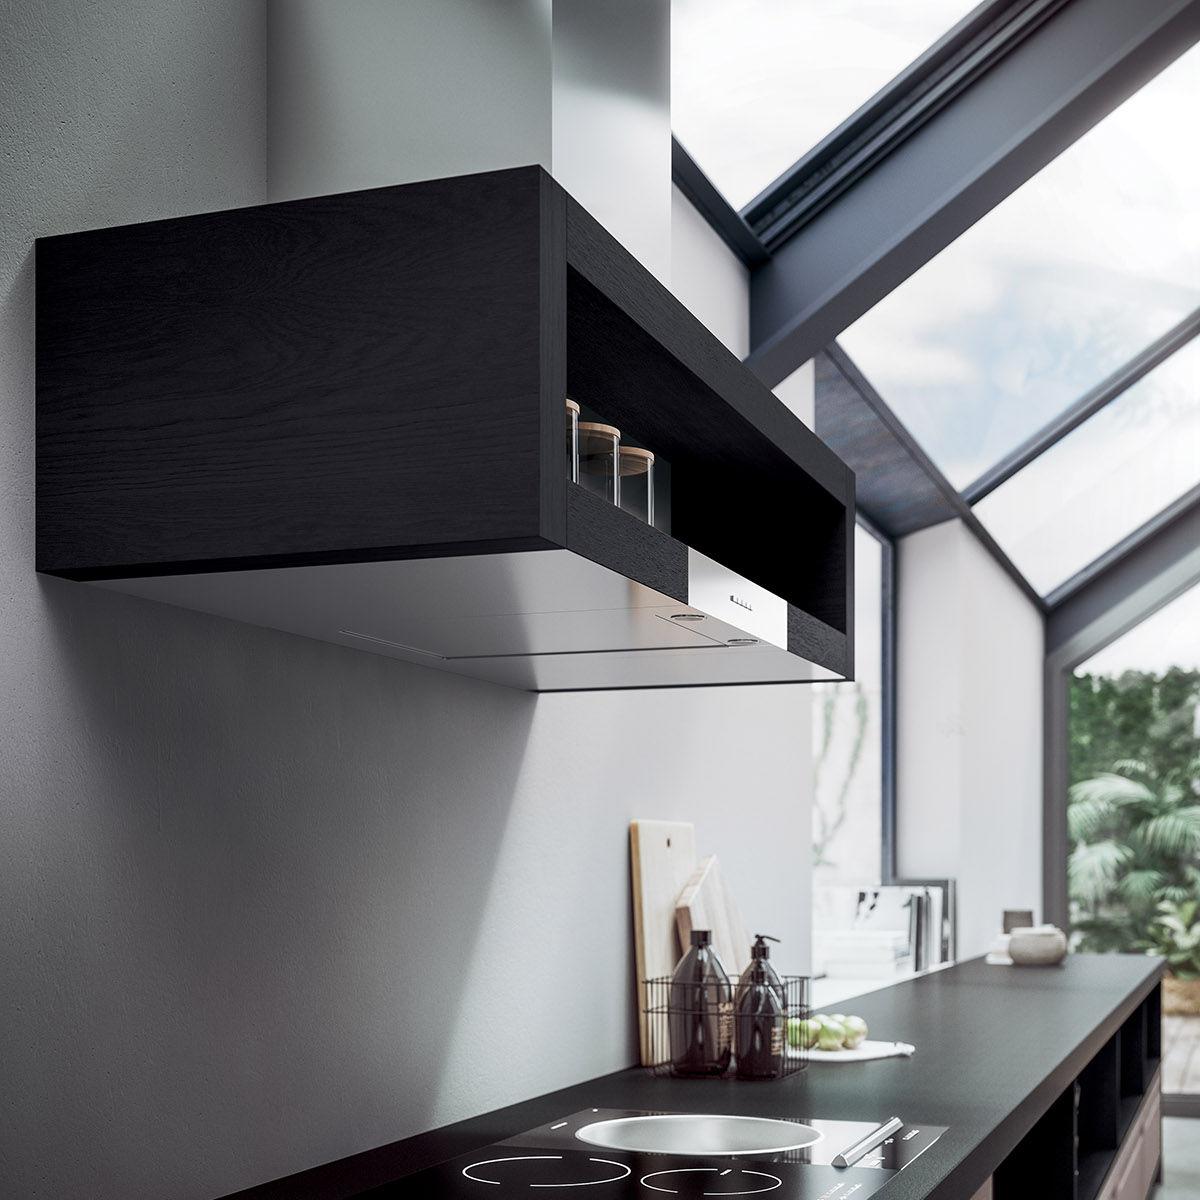 Wall-mounted range hood - TREVISO - GD Arredamenti